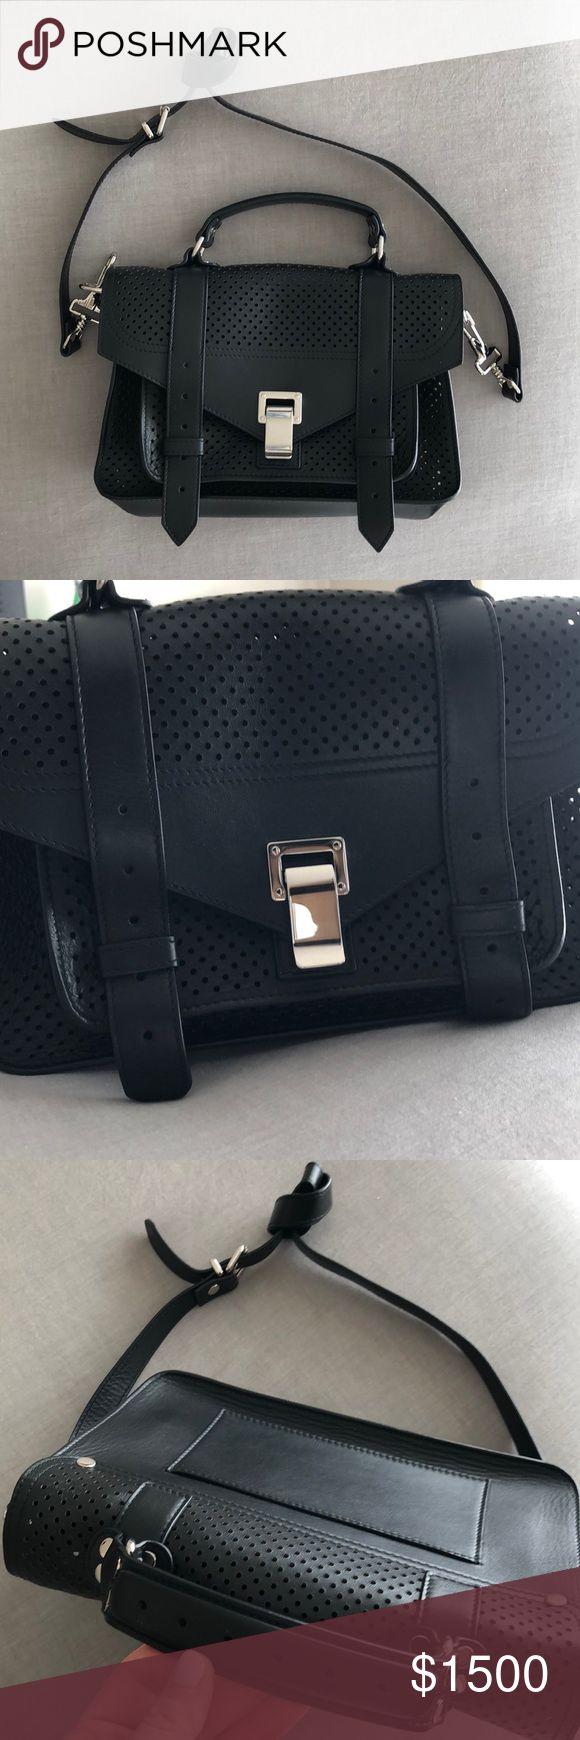 Proenza Schouler perforated ps1 bag Black perforated Proenza Schouler ps1 bag. Worn twice! In perfect condition. Proenza Schouler Bags Shoulder Bags